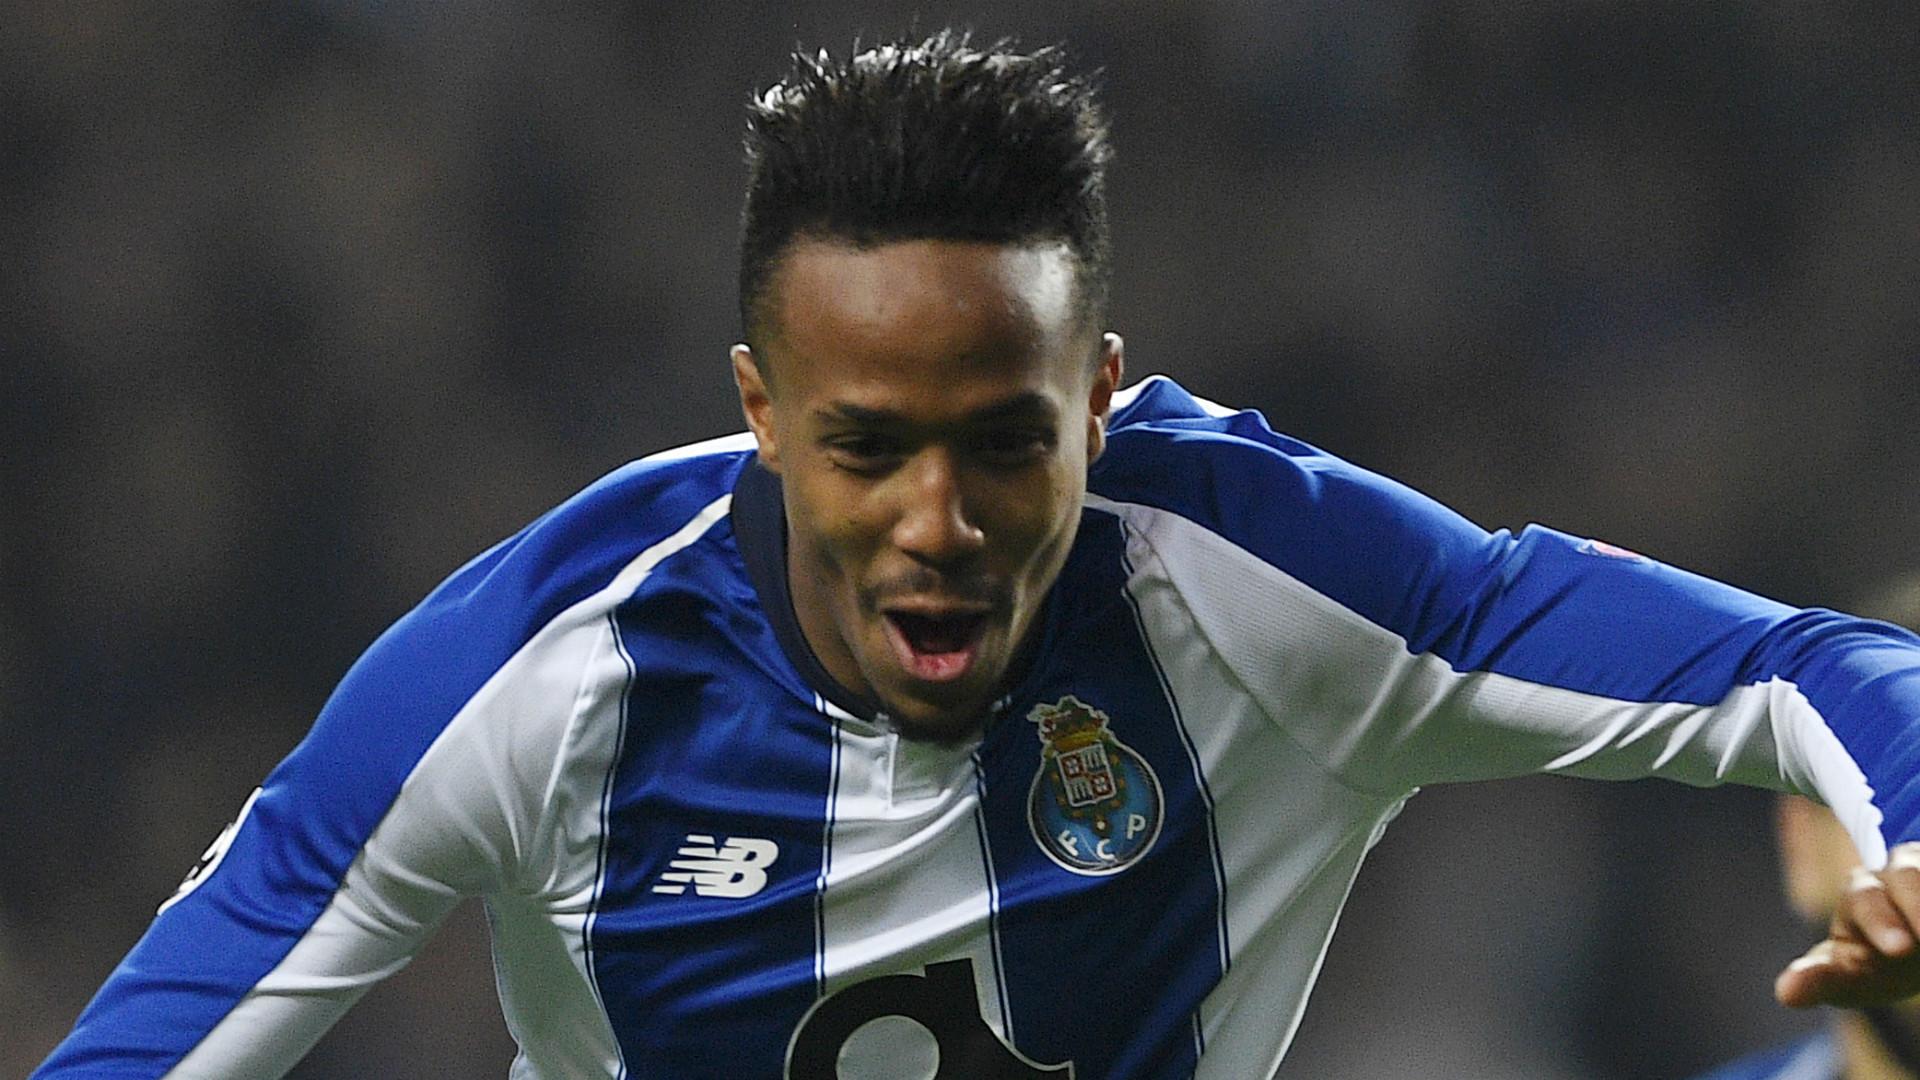 Eder Militao Update: Real Madrid Lead Man Utd In Race For €50m Porto Defender